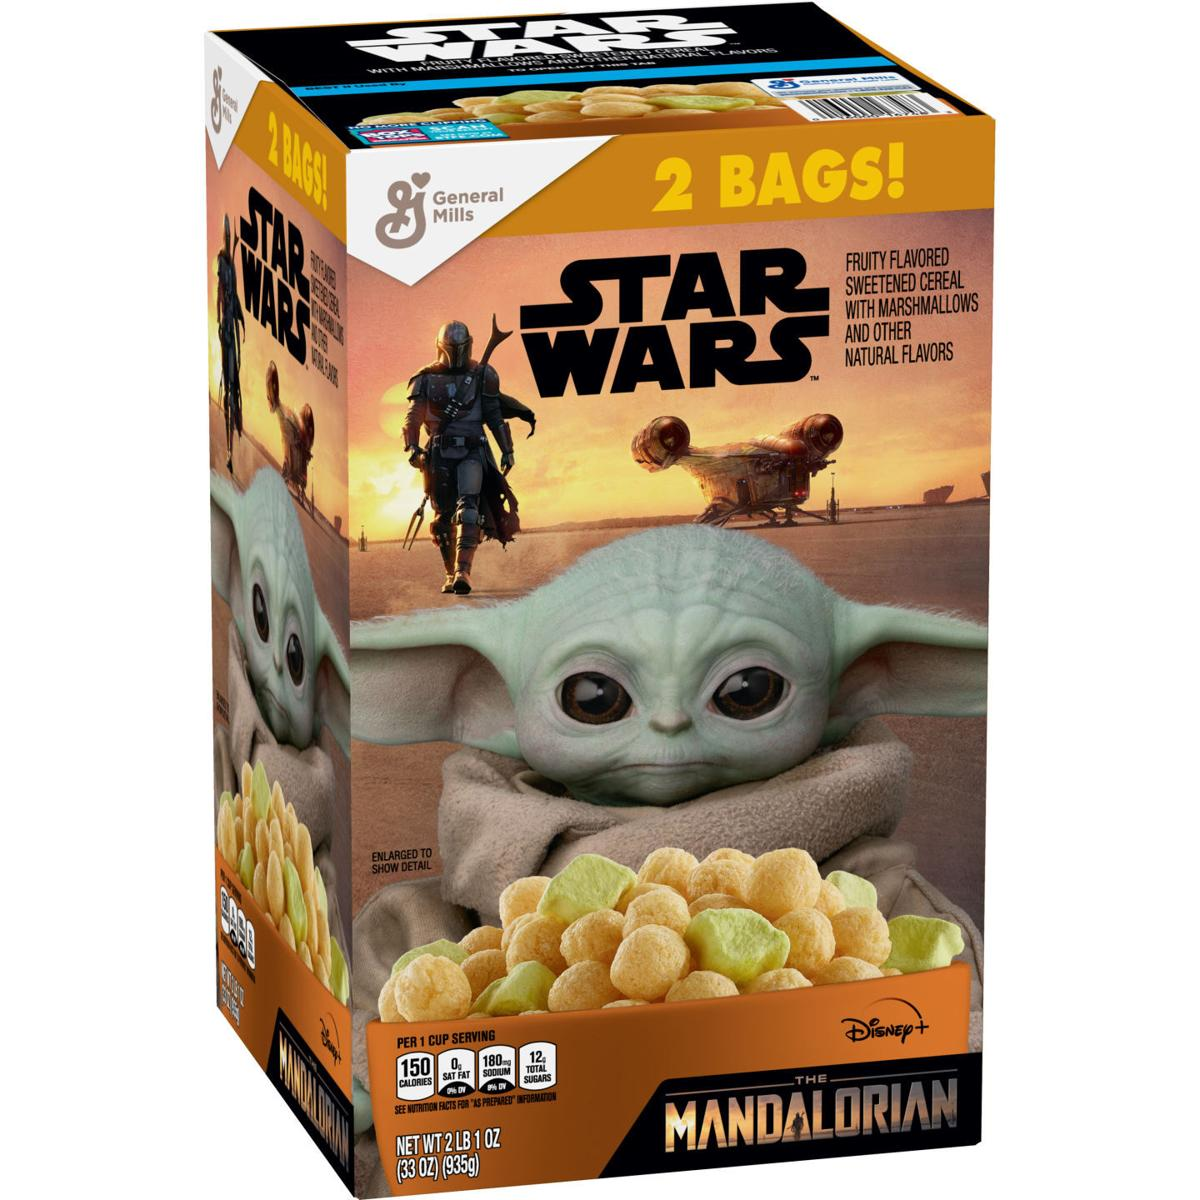 Mandalorian cereal